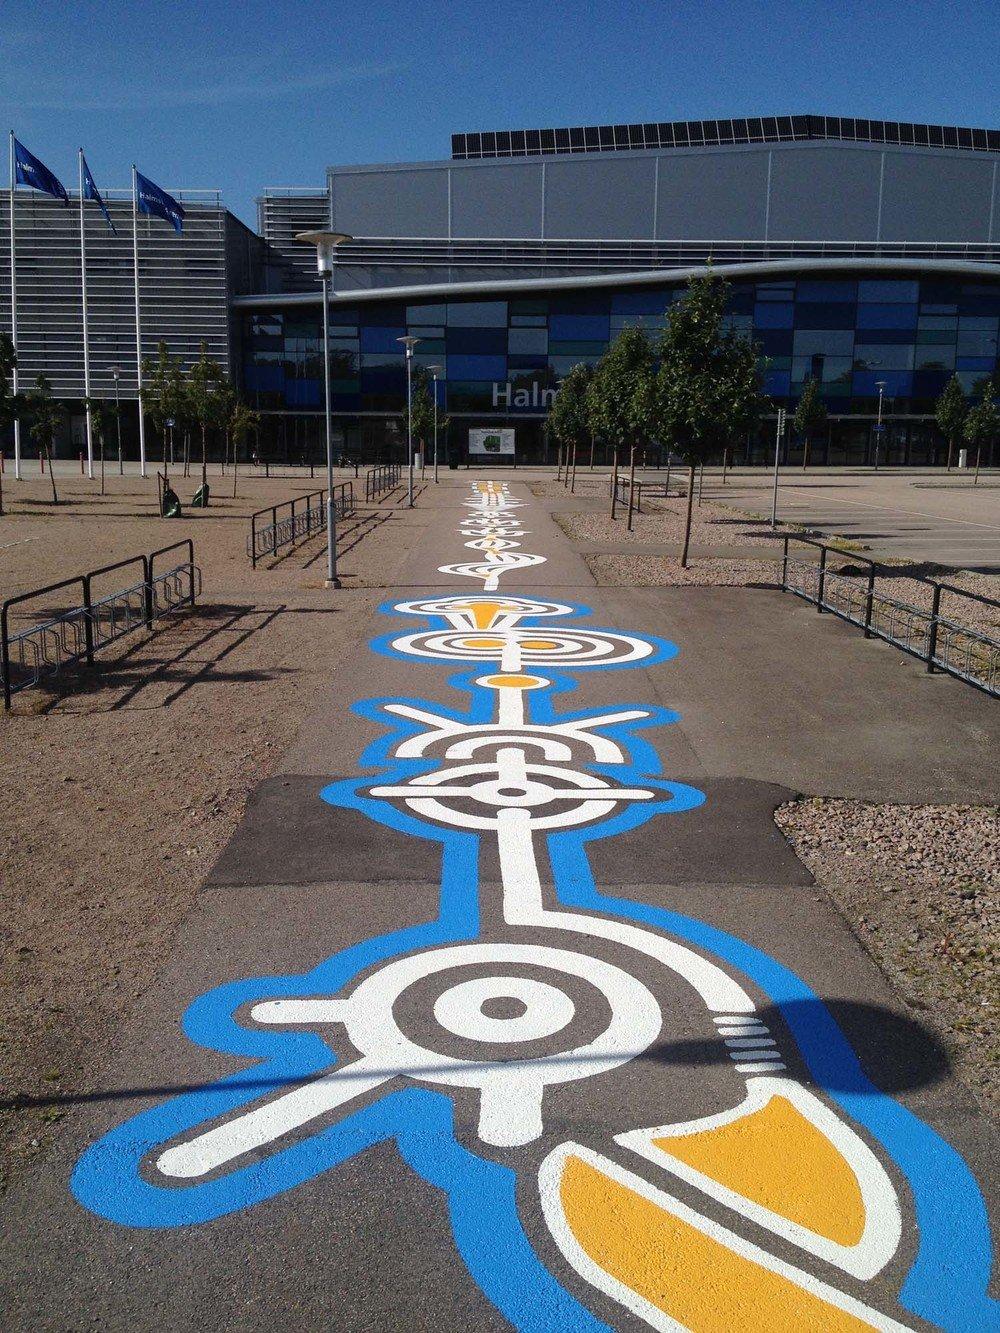 street-art-piste-ciclabili-montreal-roadsworth-21